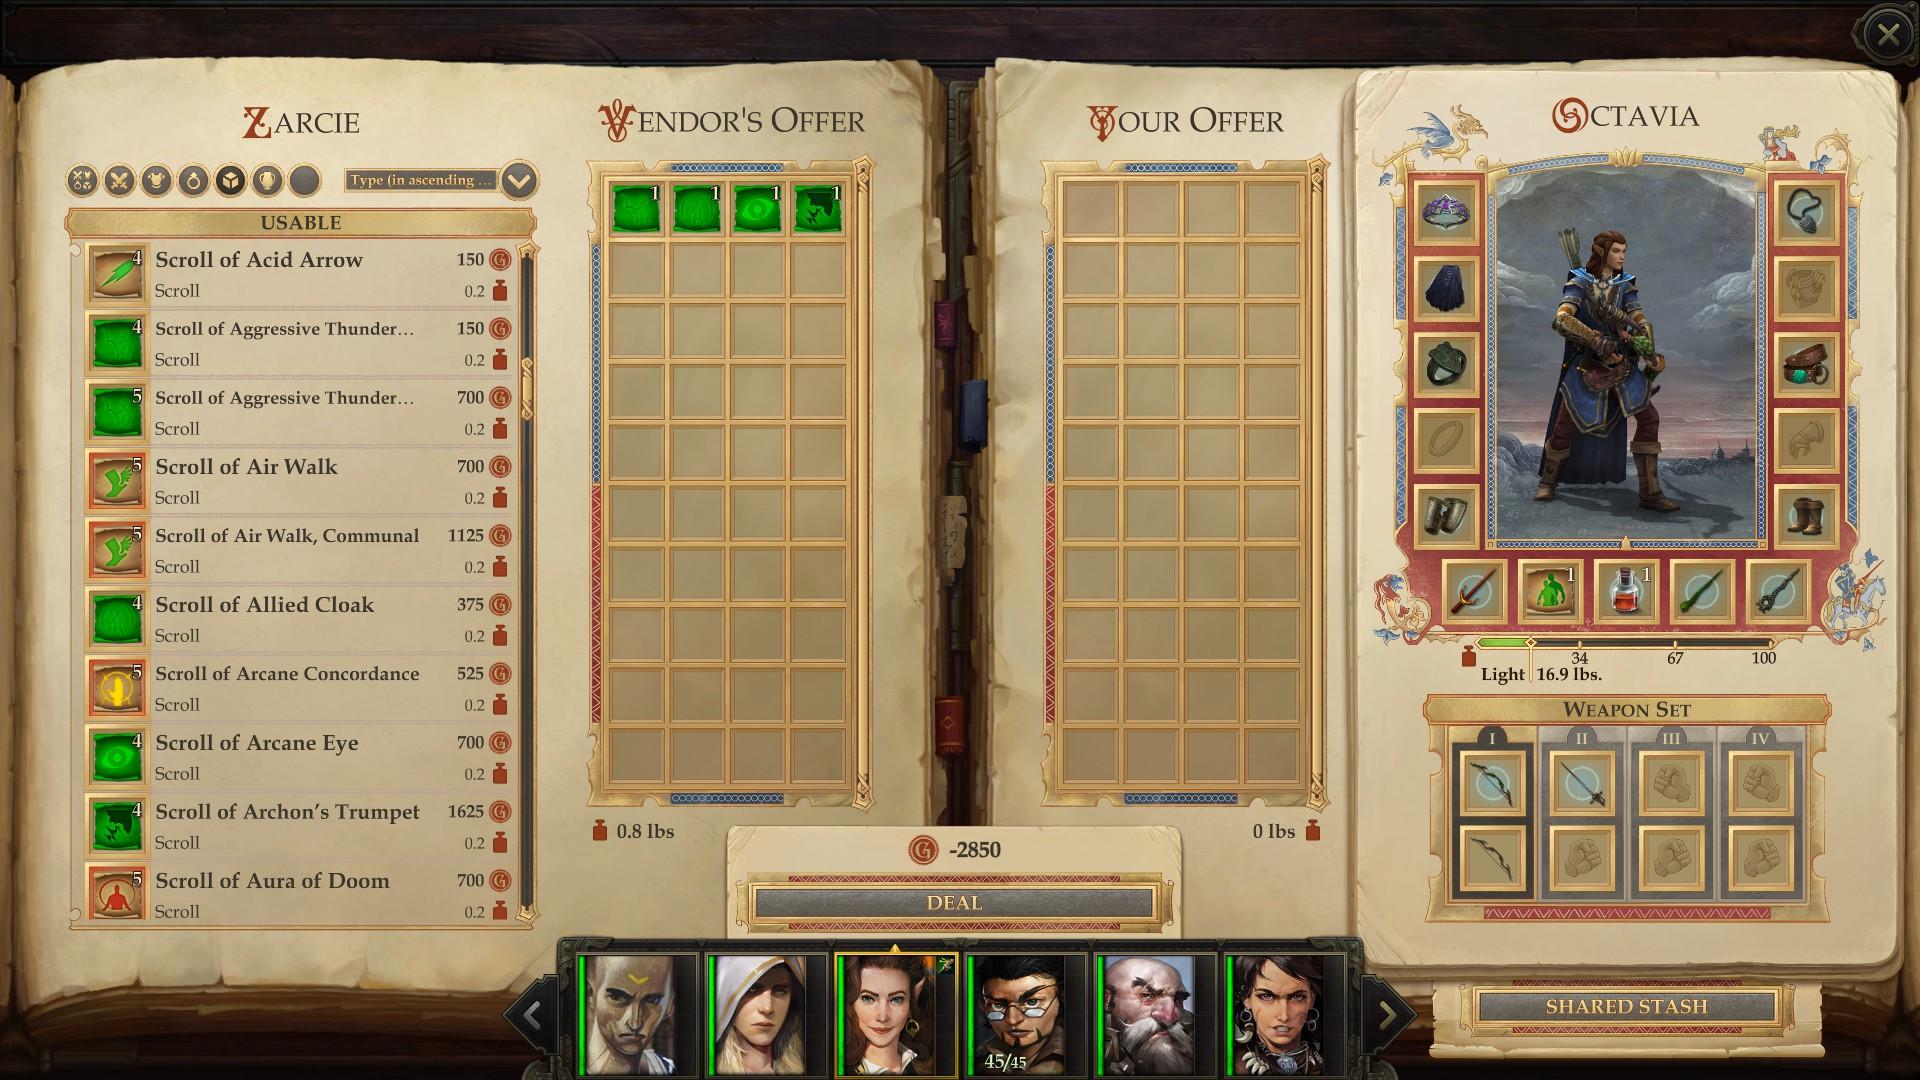 Highlight Learnable Scrolls turns scrolls green